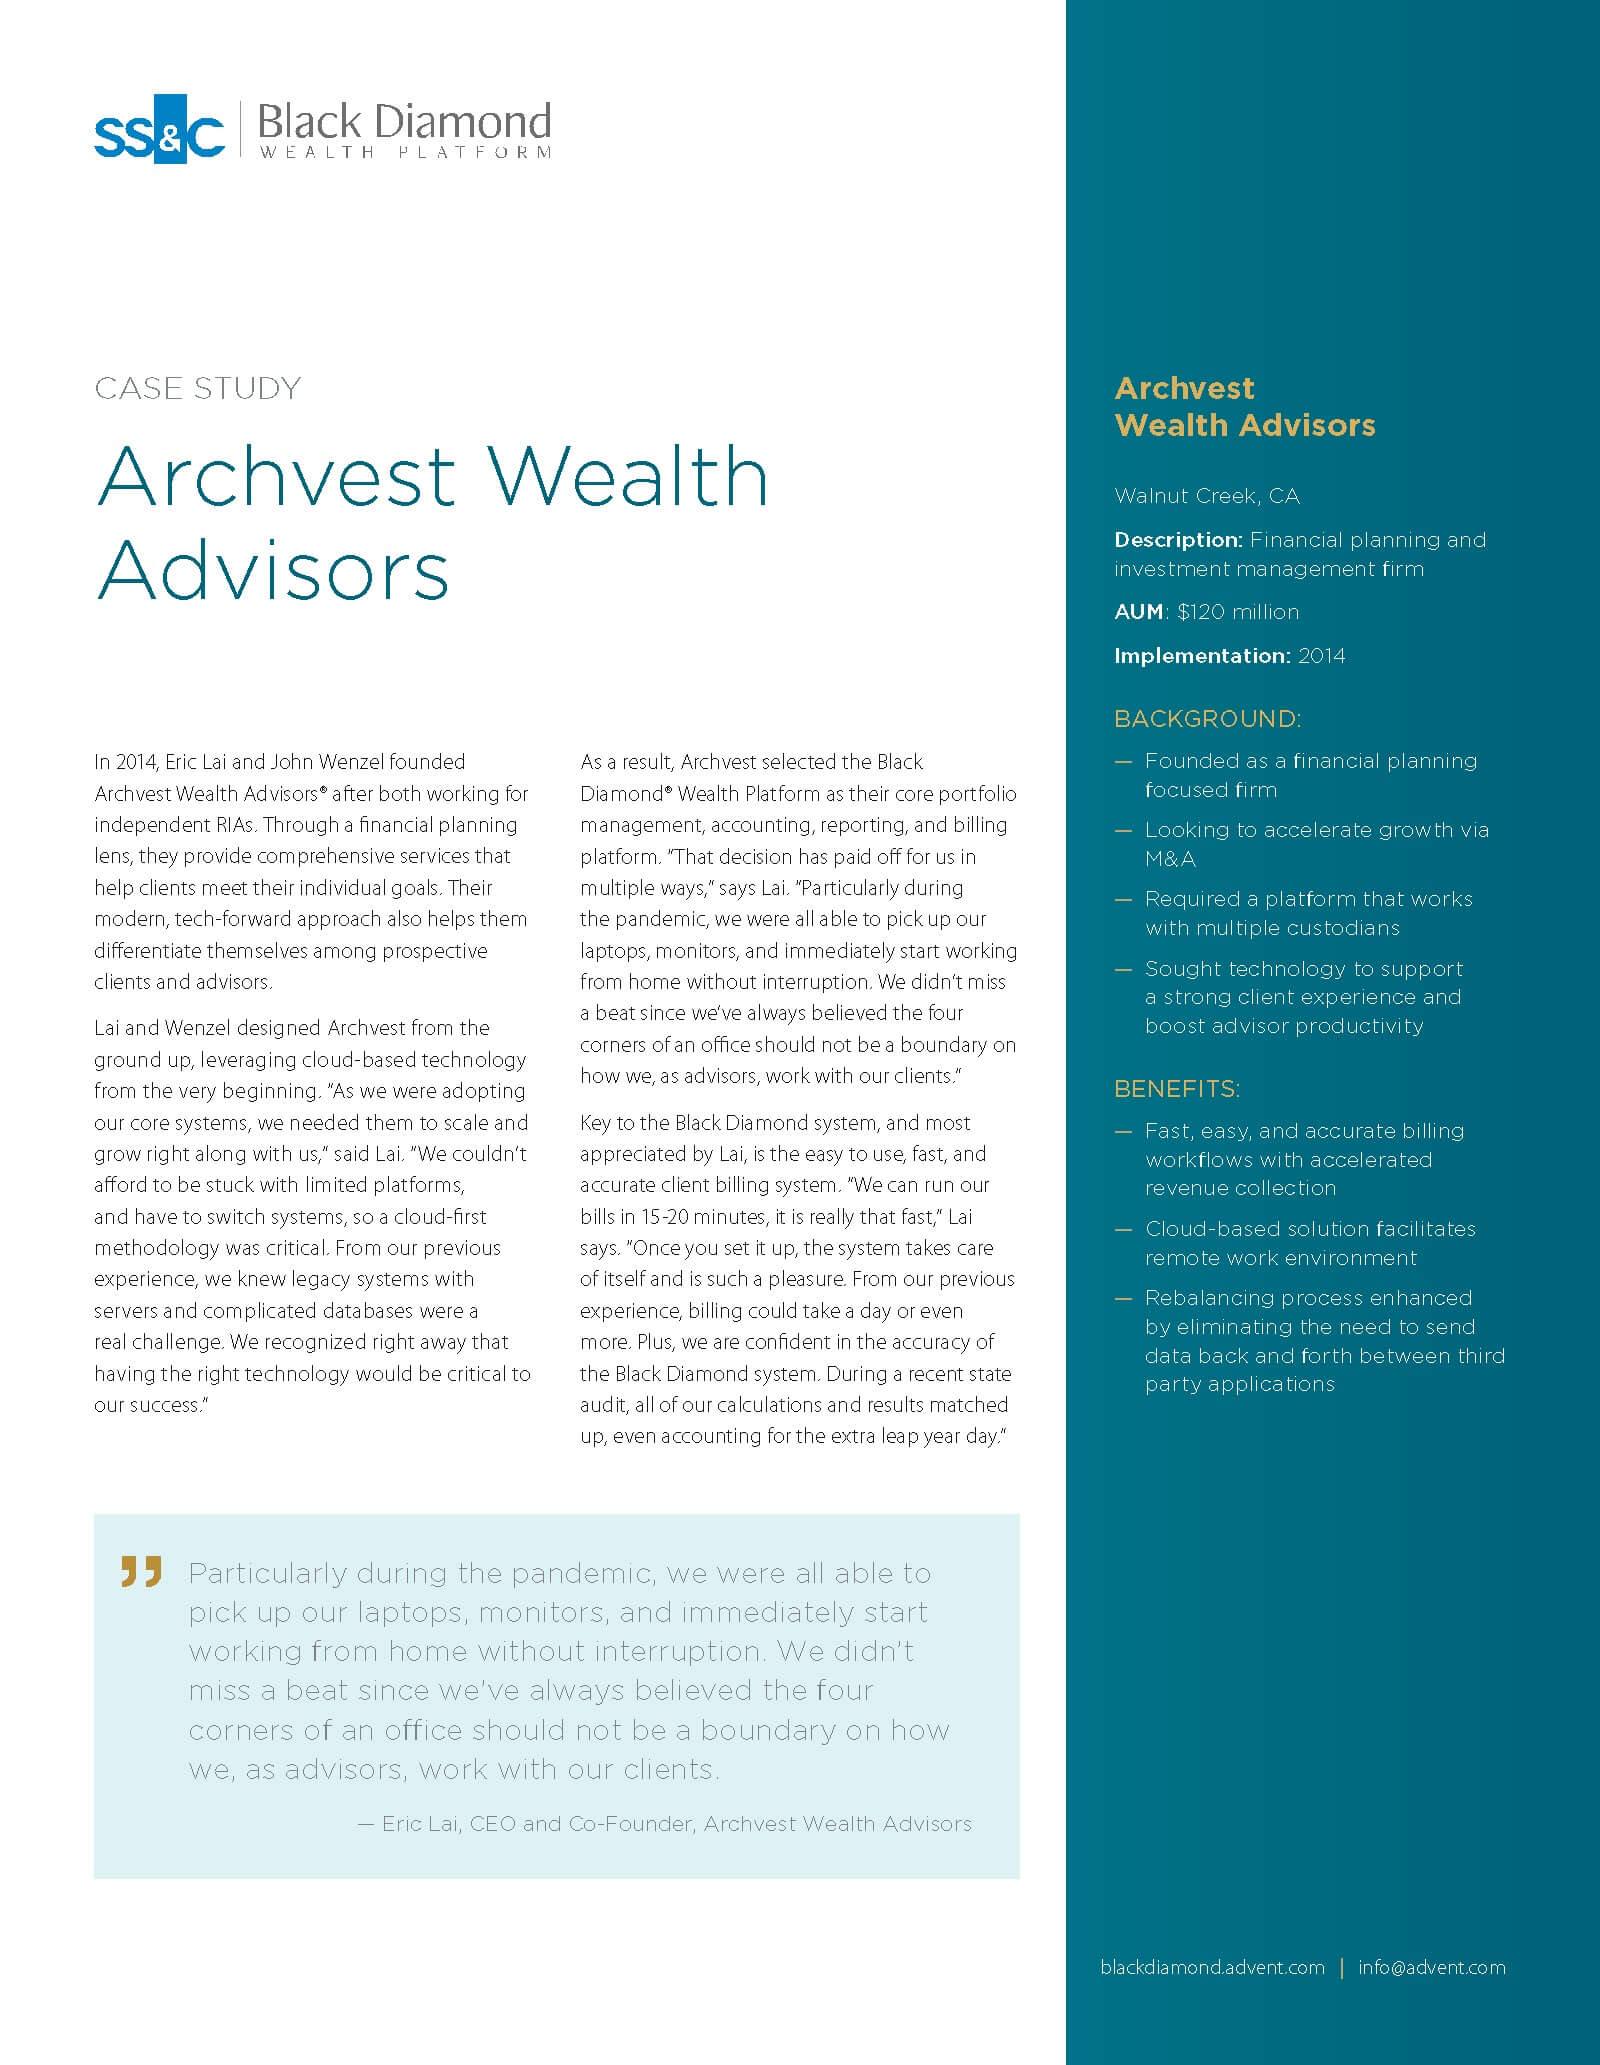 poster image for <p>Archvest Wealth Advisors</p>